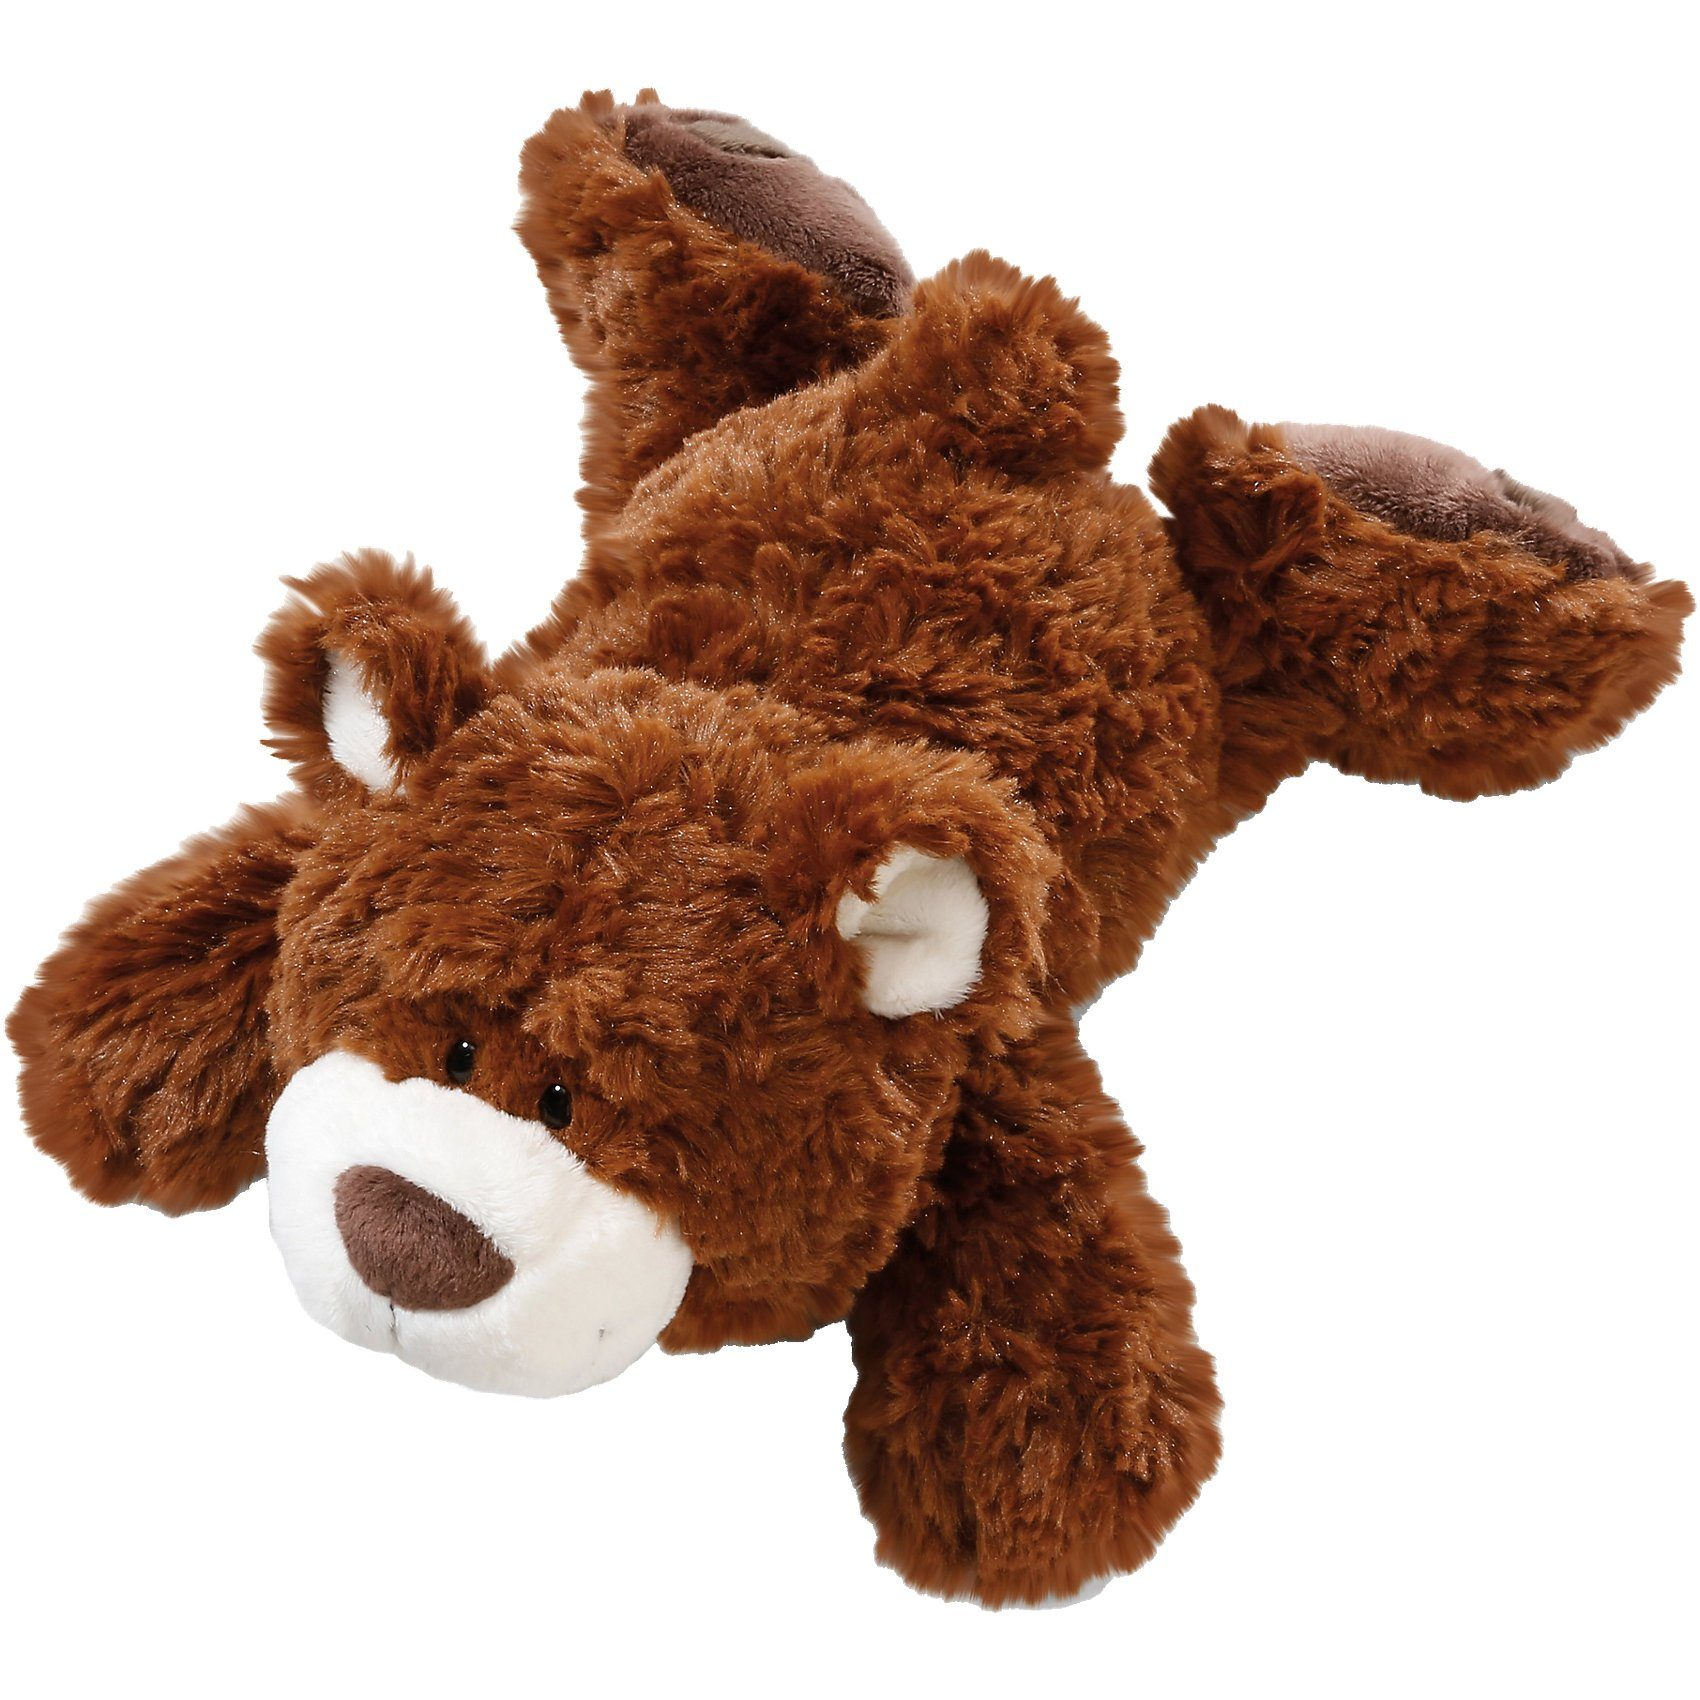 Bär liegend, 20cm (41498)